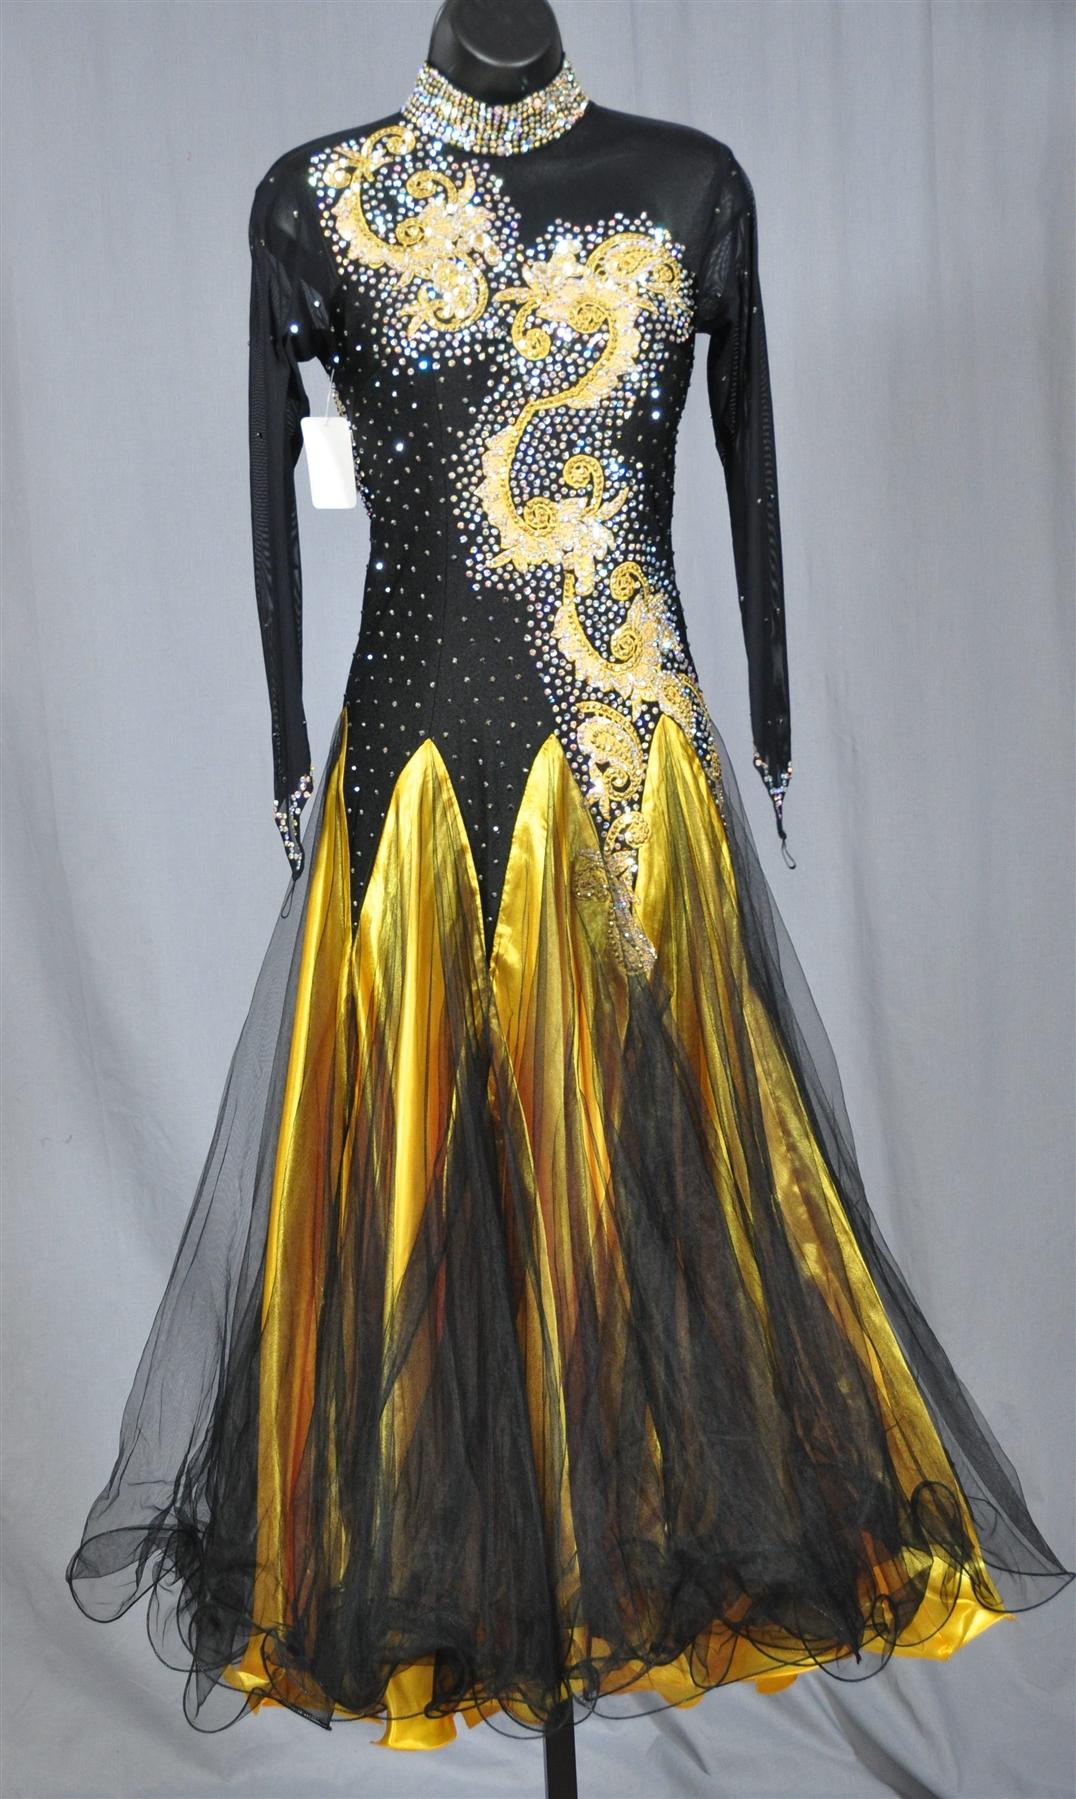 Elegant Black And Gold Long Mesh Sleeves Ballroom Dress